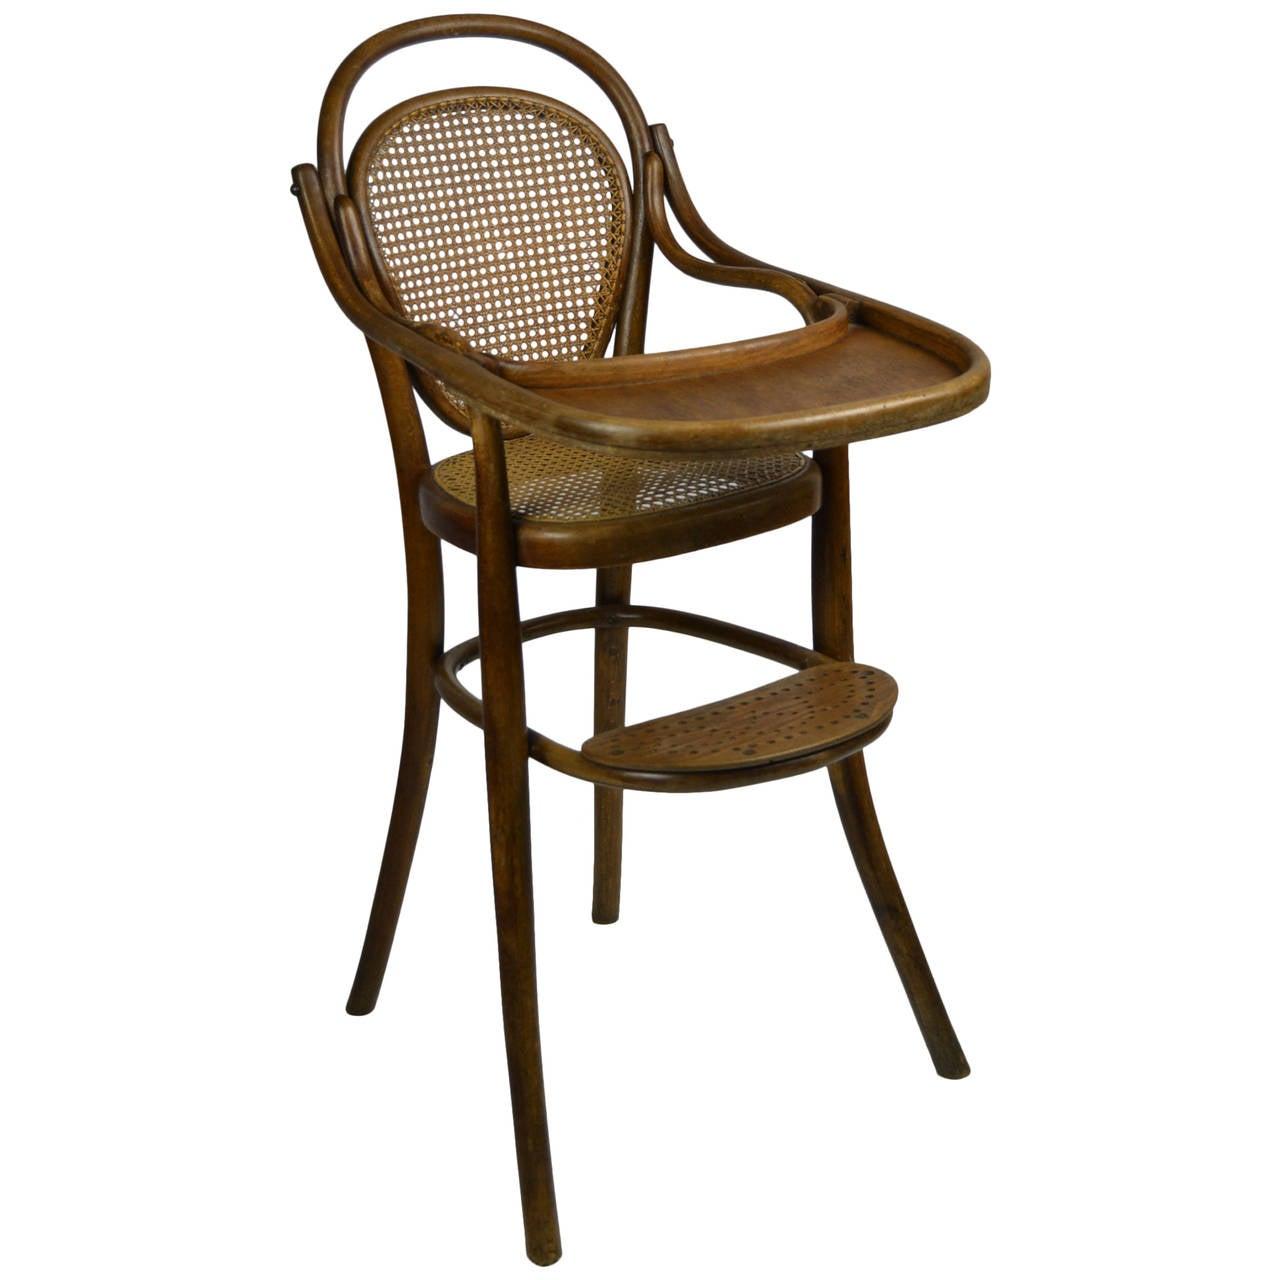 Antique Thonet Children's Chair For Sale - Antique Thonet Children's Chair At 1stdibs